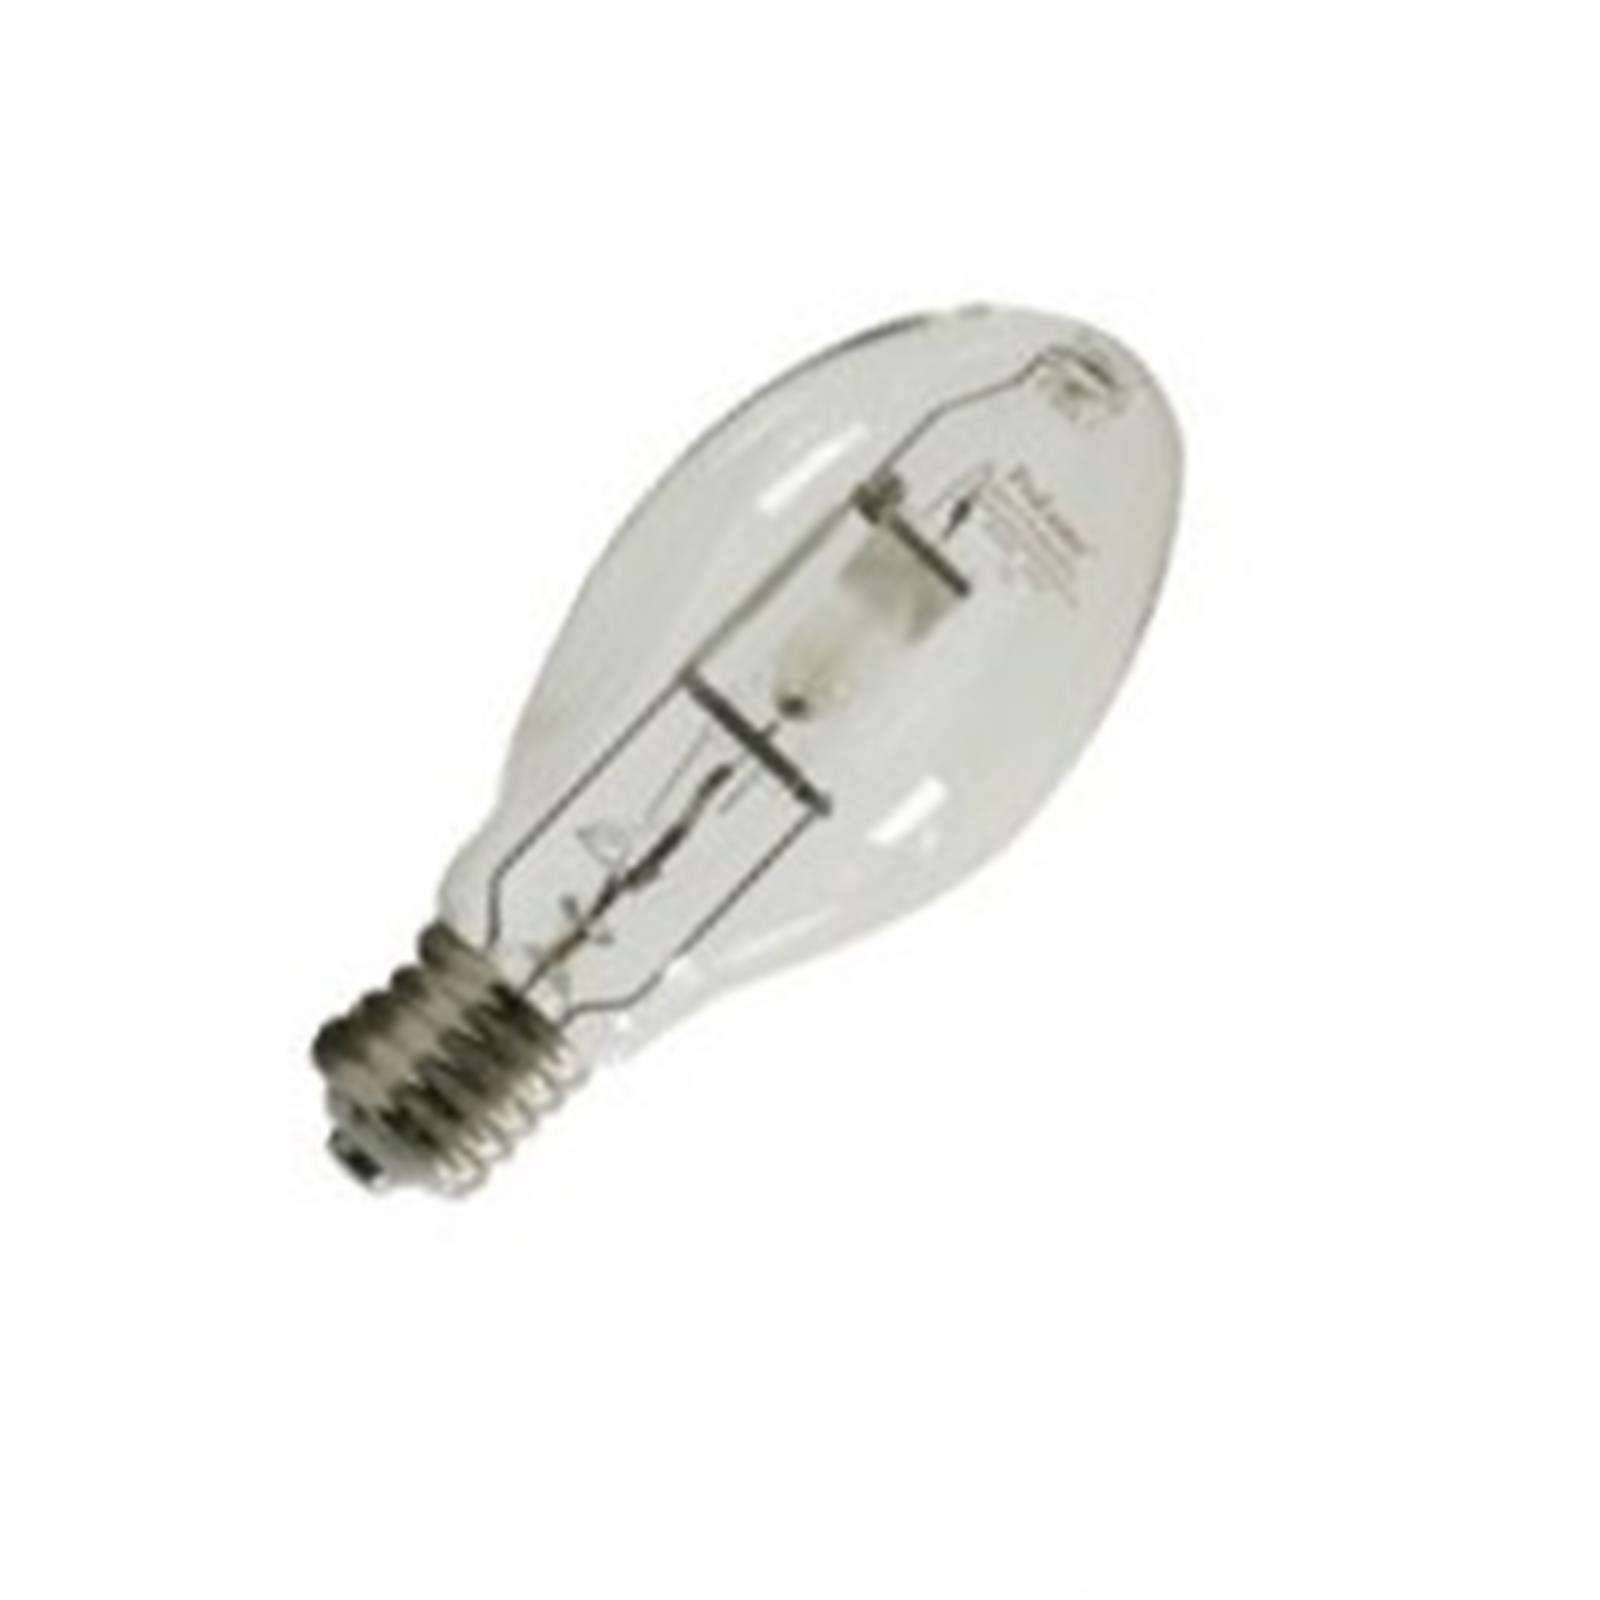 6 Qty. Halco 150W MH ED28 MOG PS ProLumeUN2911 M102/E MH150/U/PS 150w HID Pulse Start Clear Lamp Bulb